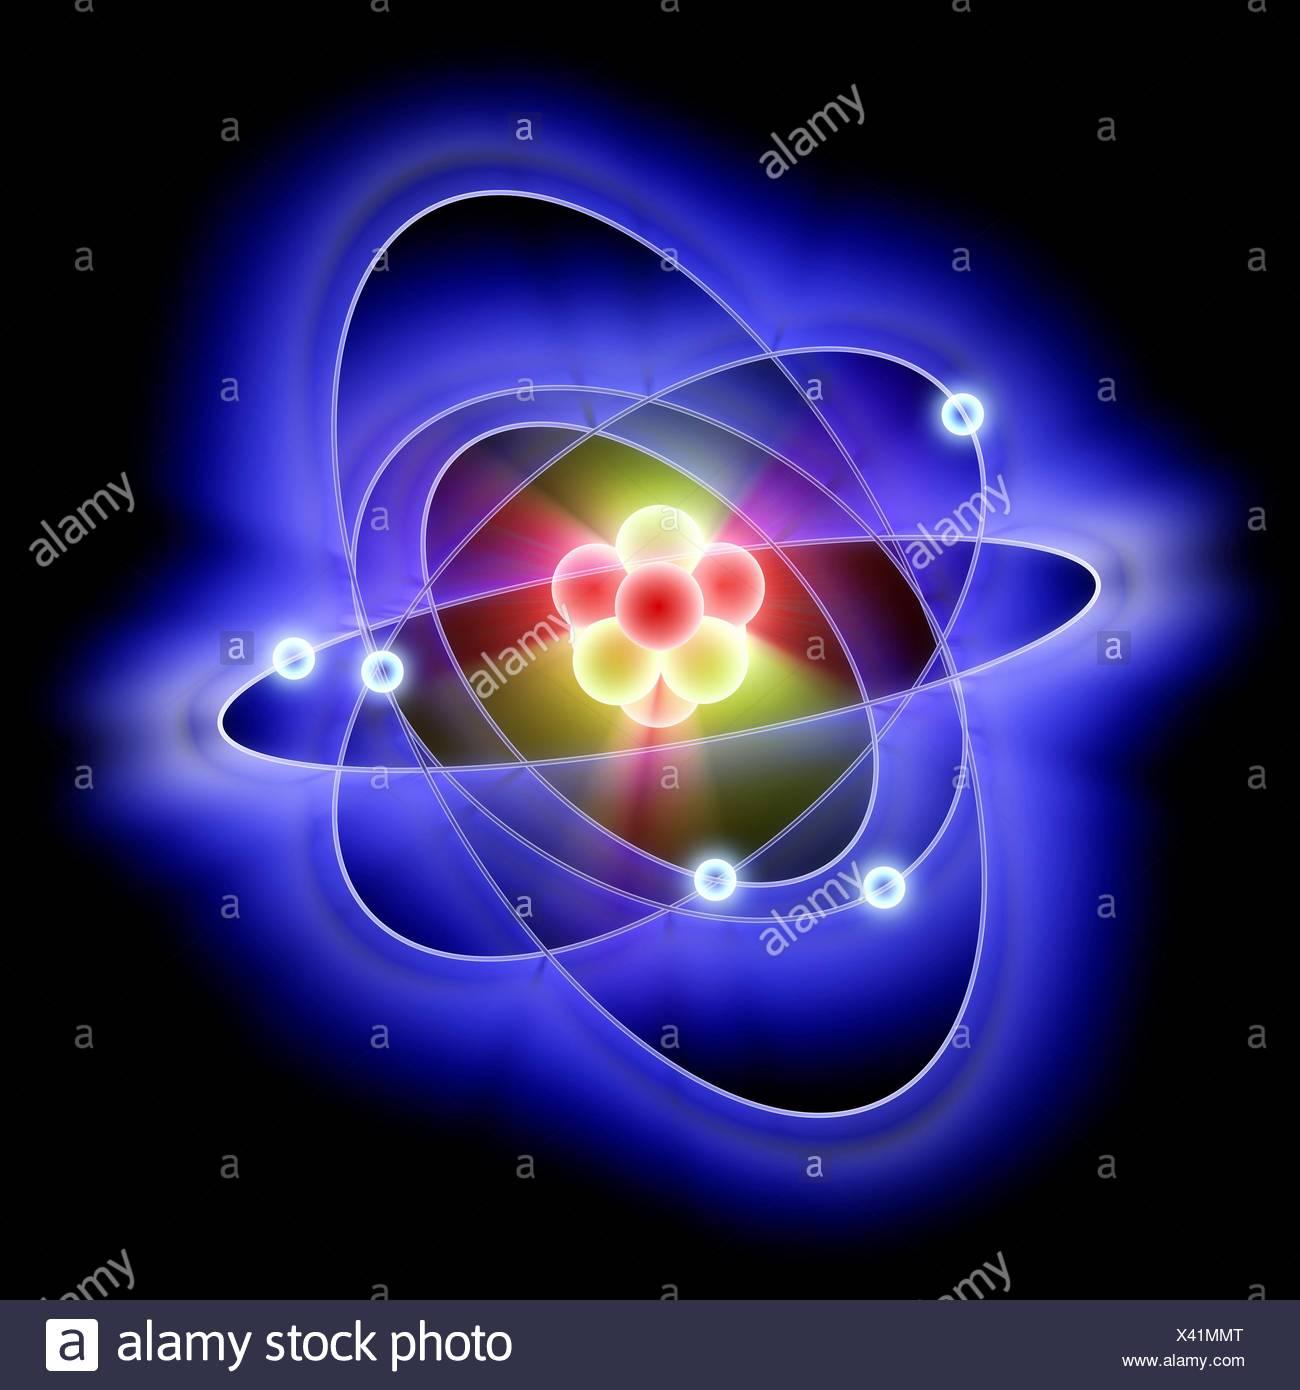 Atomic structure, artwork - Stock Image